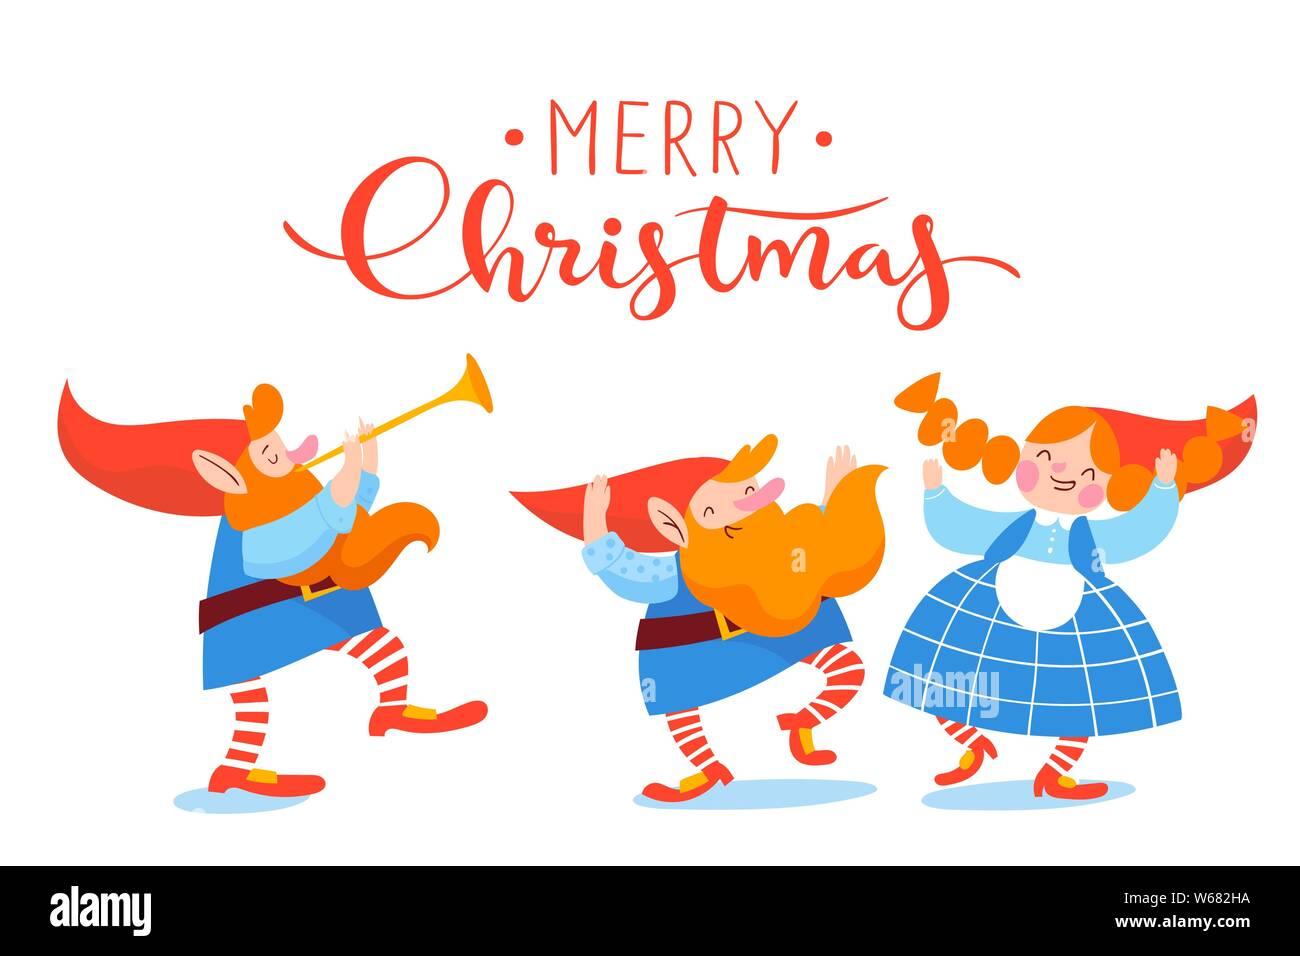 Christmas Dancing Cartoon.Christmas Poster Vector Design With Cartoon Leprechauns